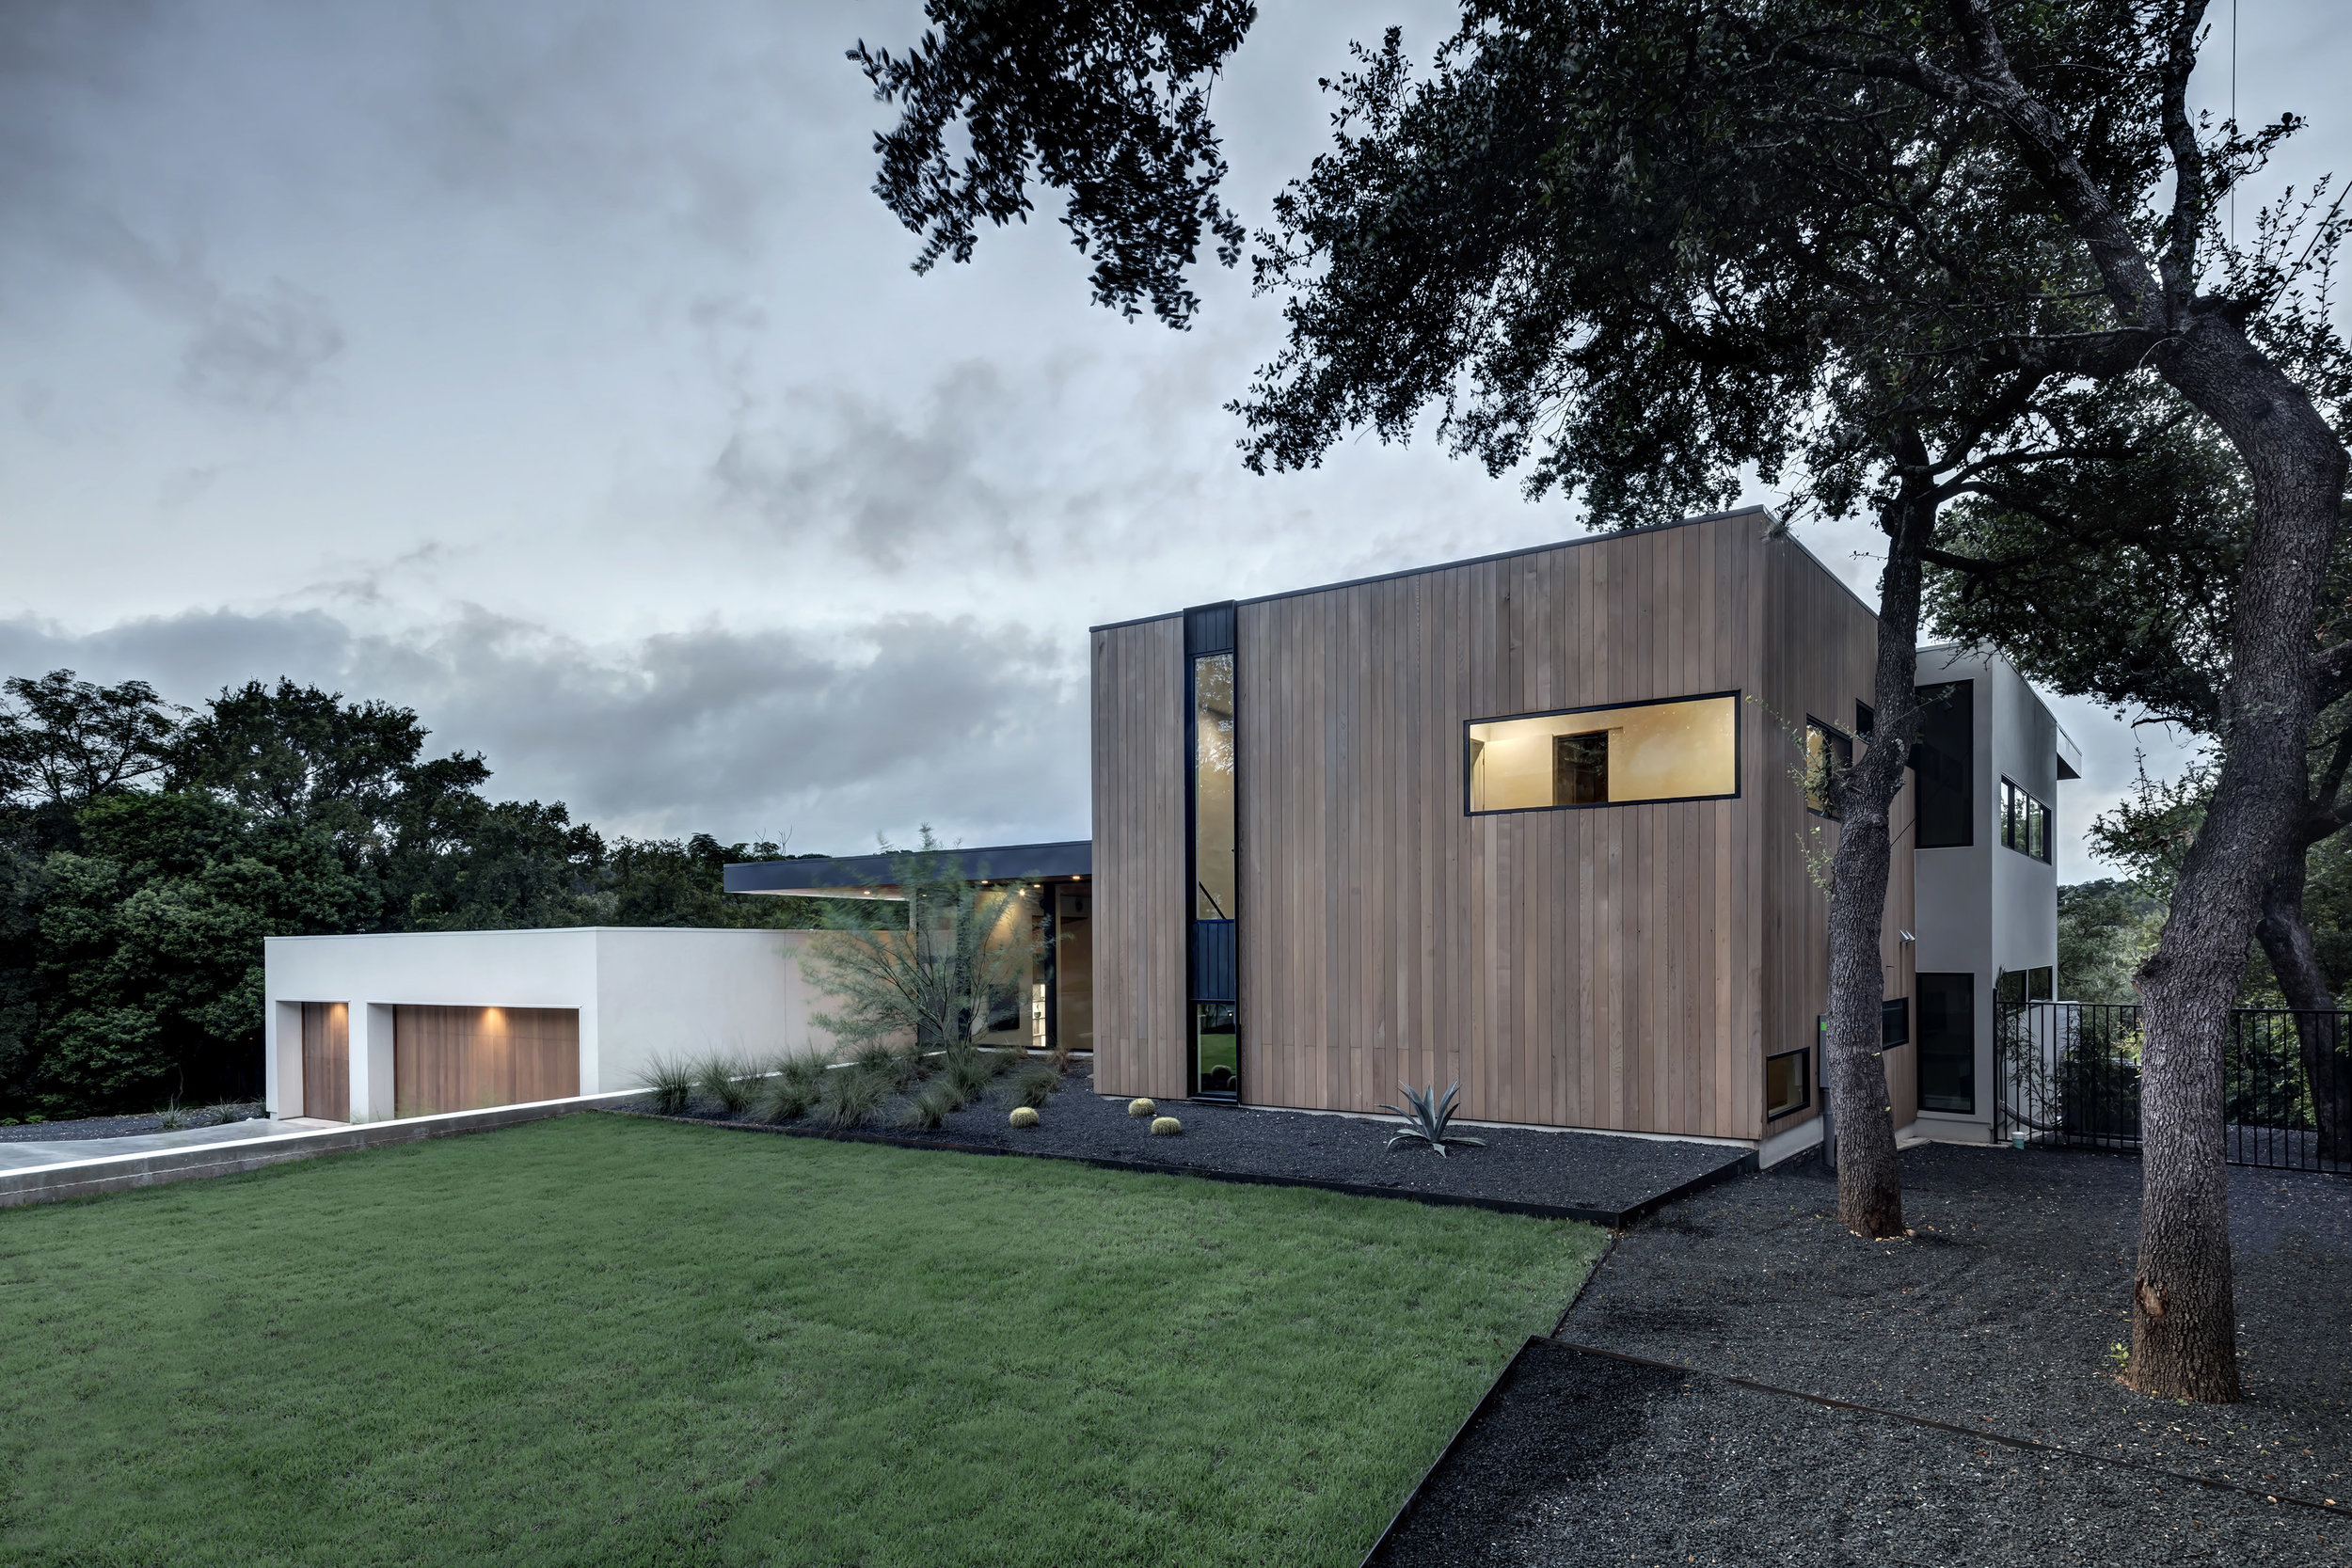 Matt Fajkus MF Architecture Bracketed Space House Photo 3 by Charles Davis Smith.jpg